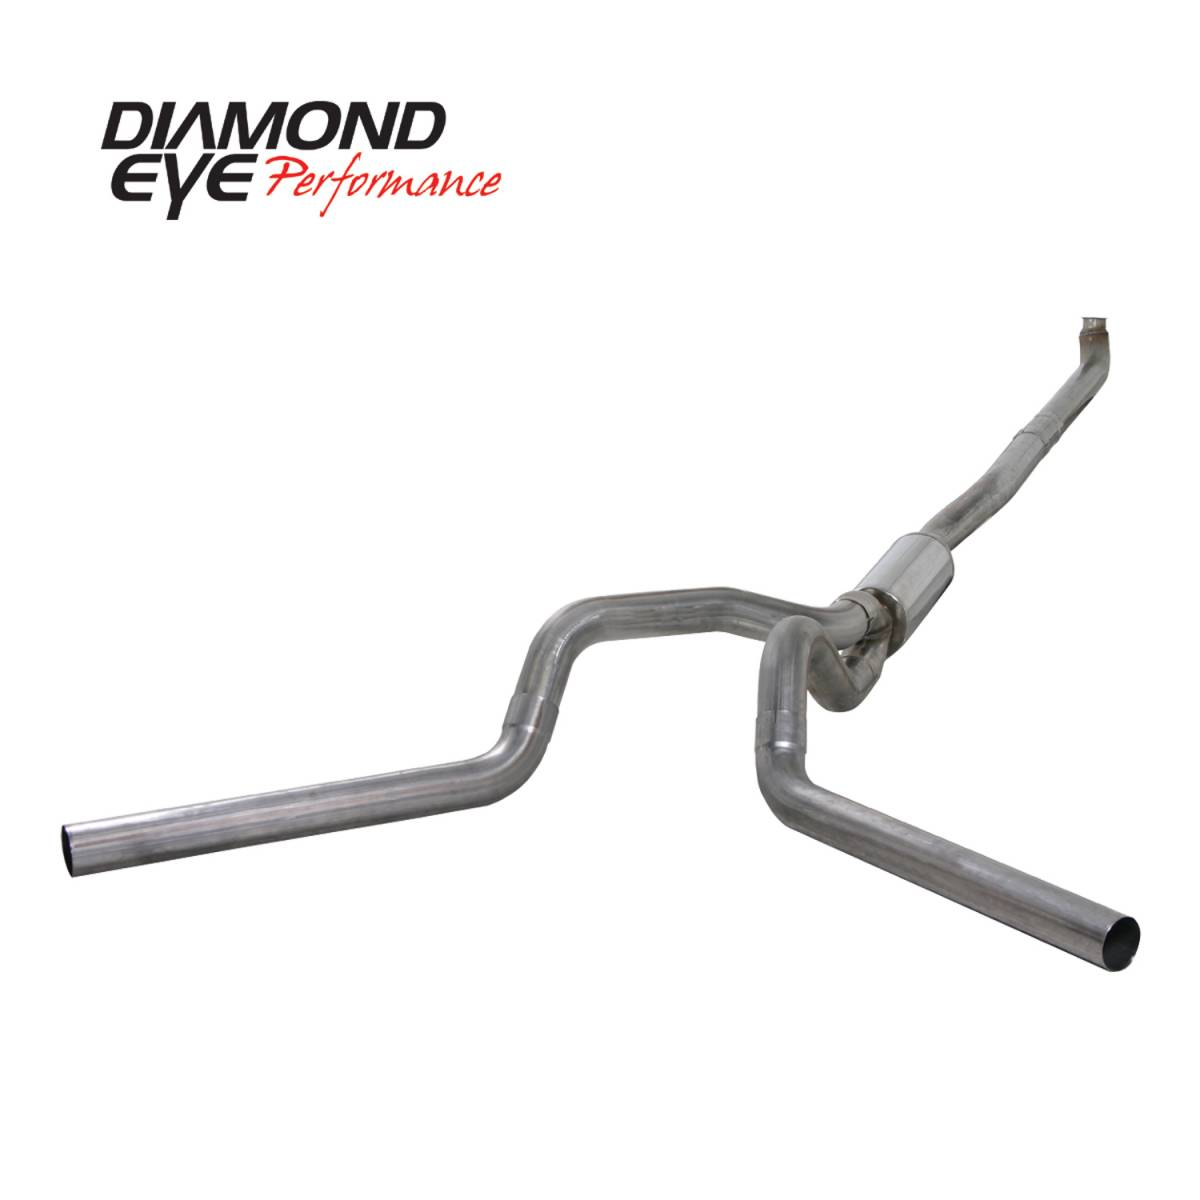 Diamond Eye Performance K S 5 Chevy Gmc 6 6l